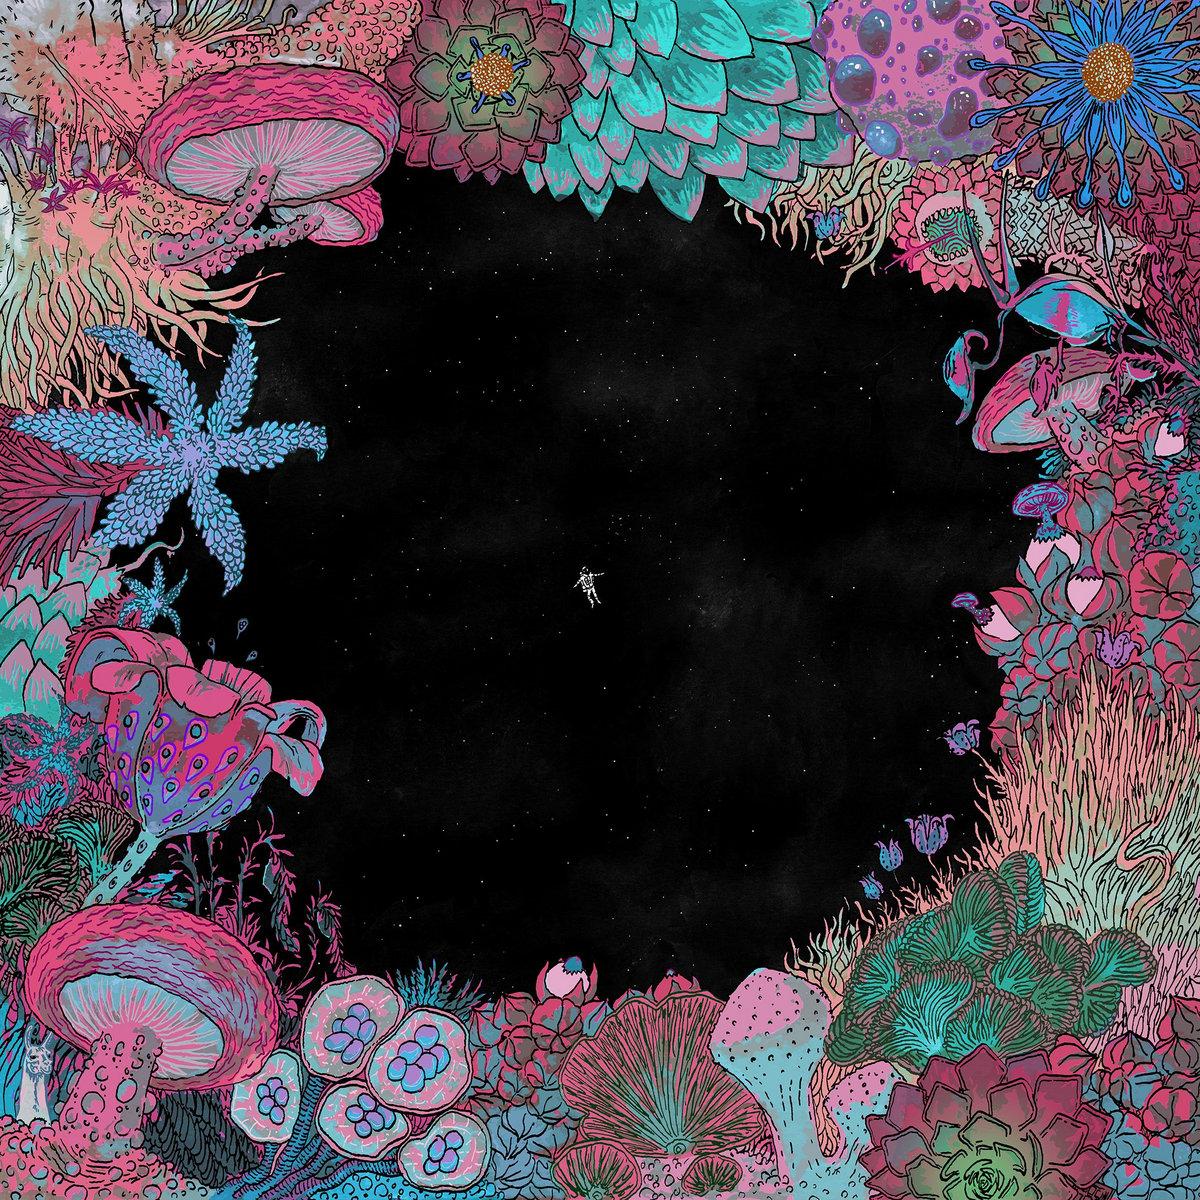 ALBER JUPITER - We Are Just Floating In Space